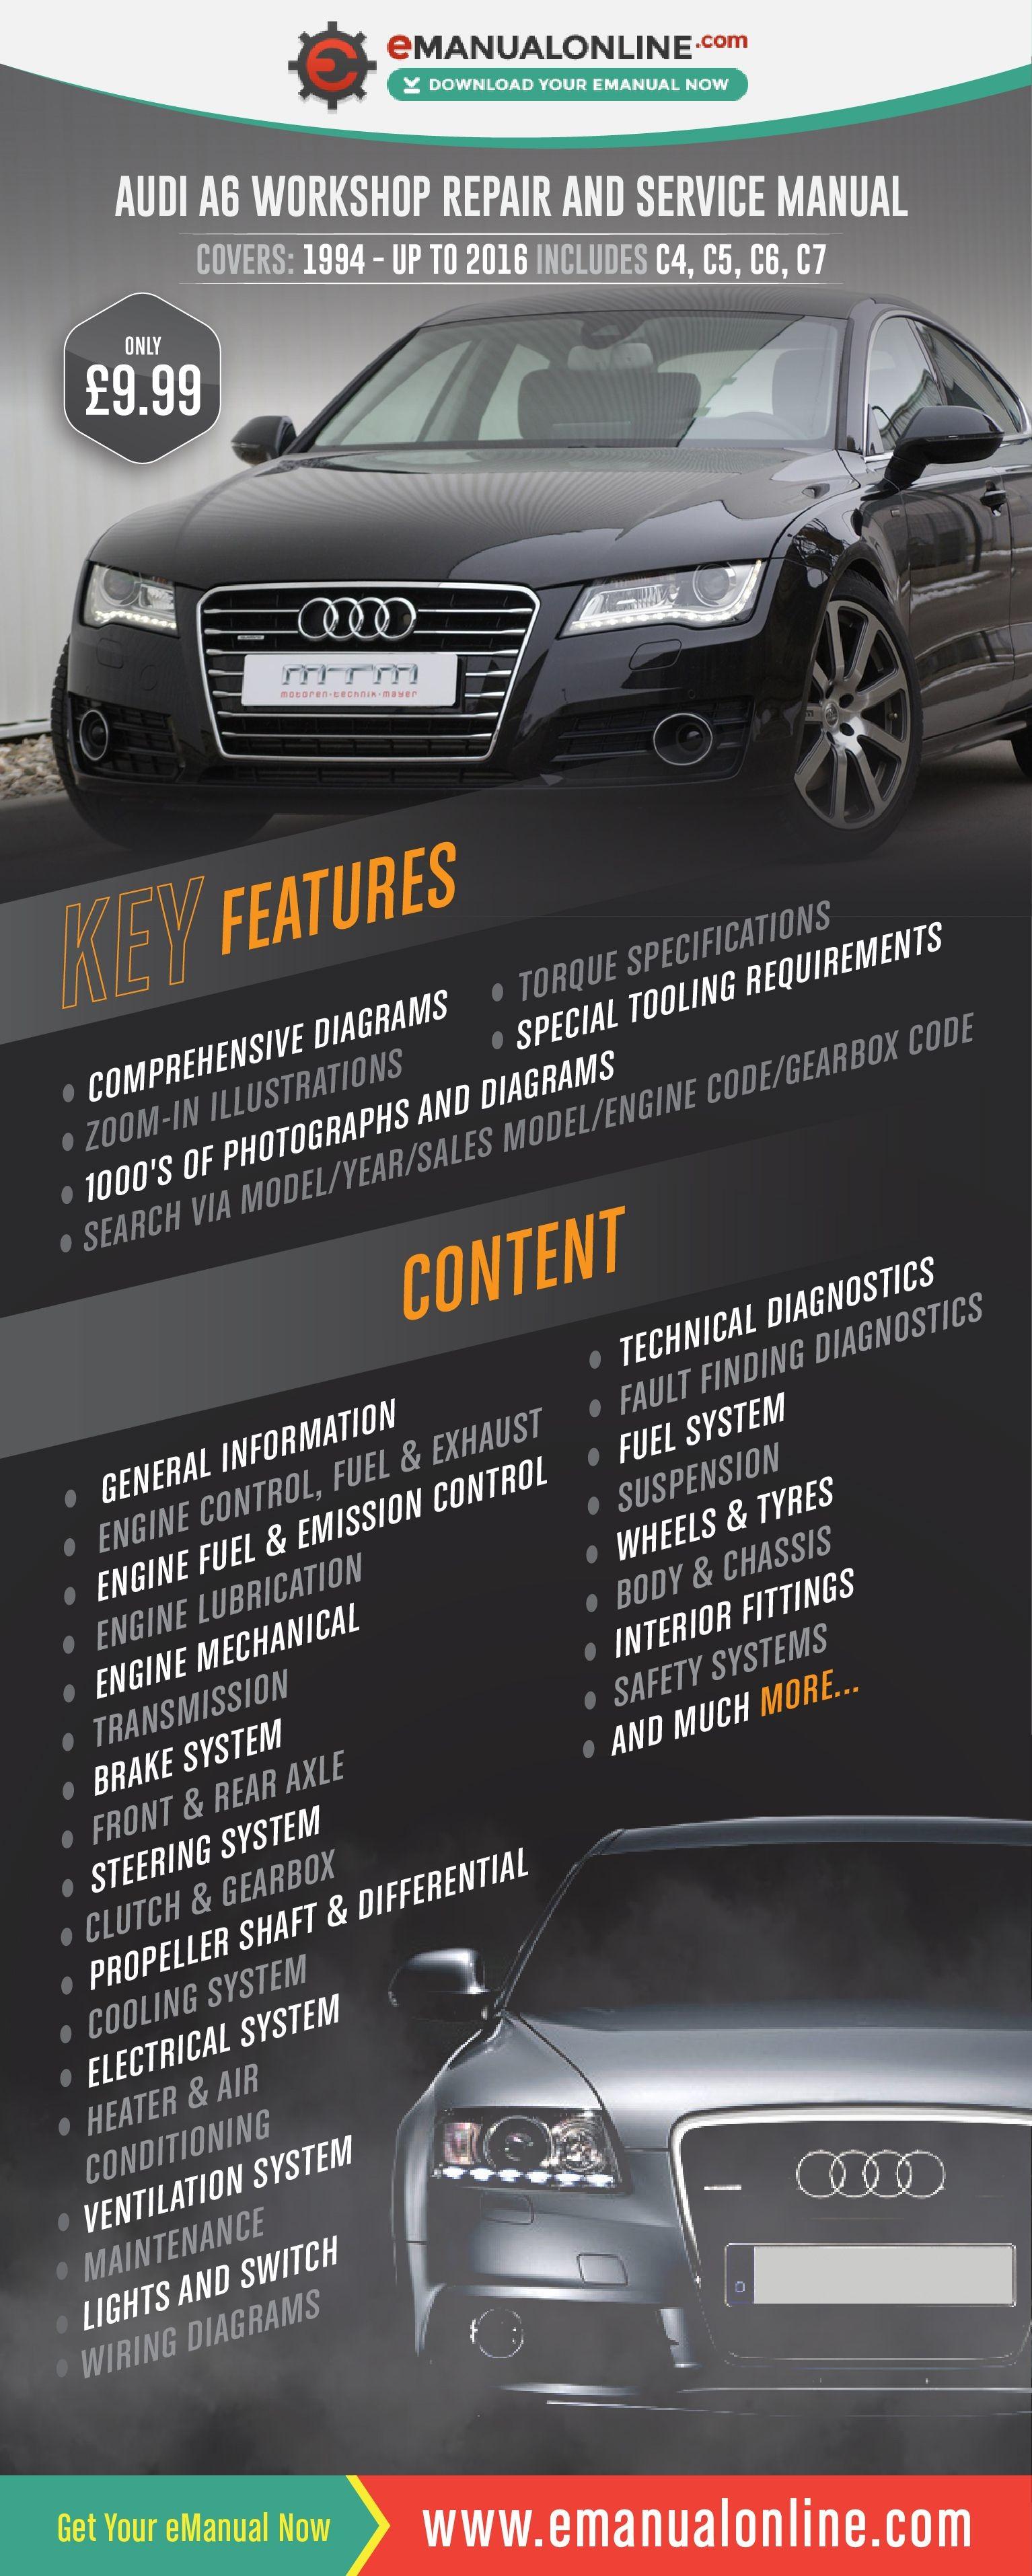 Car Heating System Diagram Audi A6 Workshop Repair and Service Manual Of Car Heating System Diagram